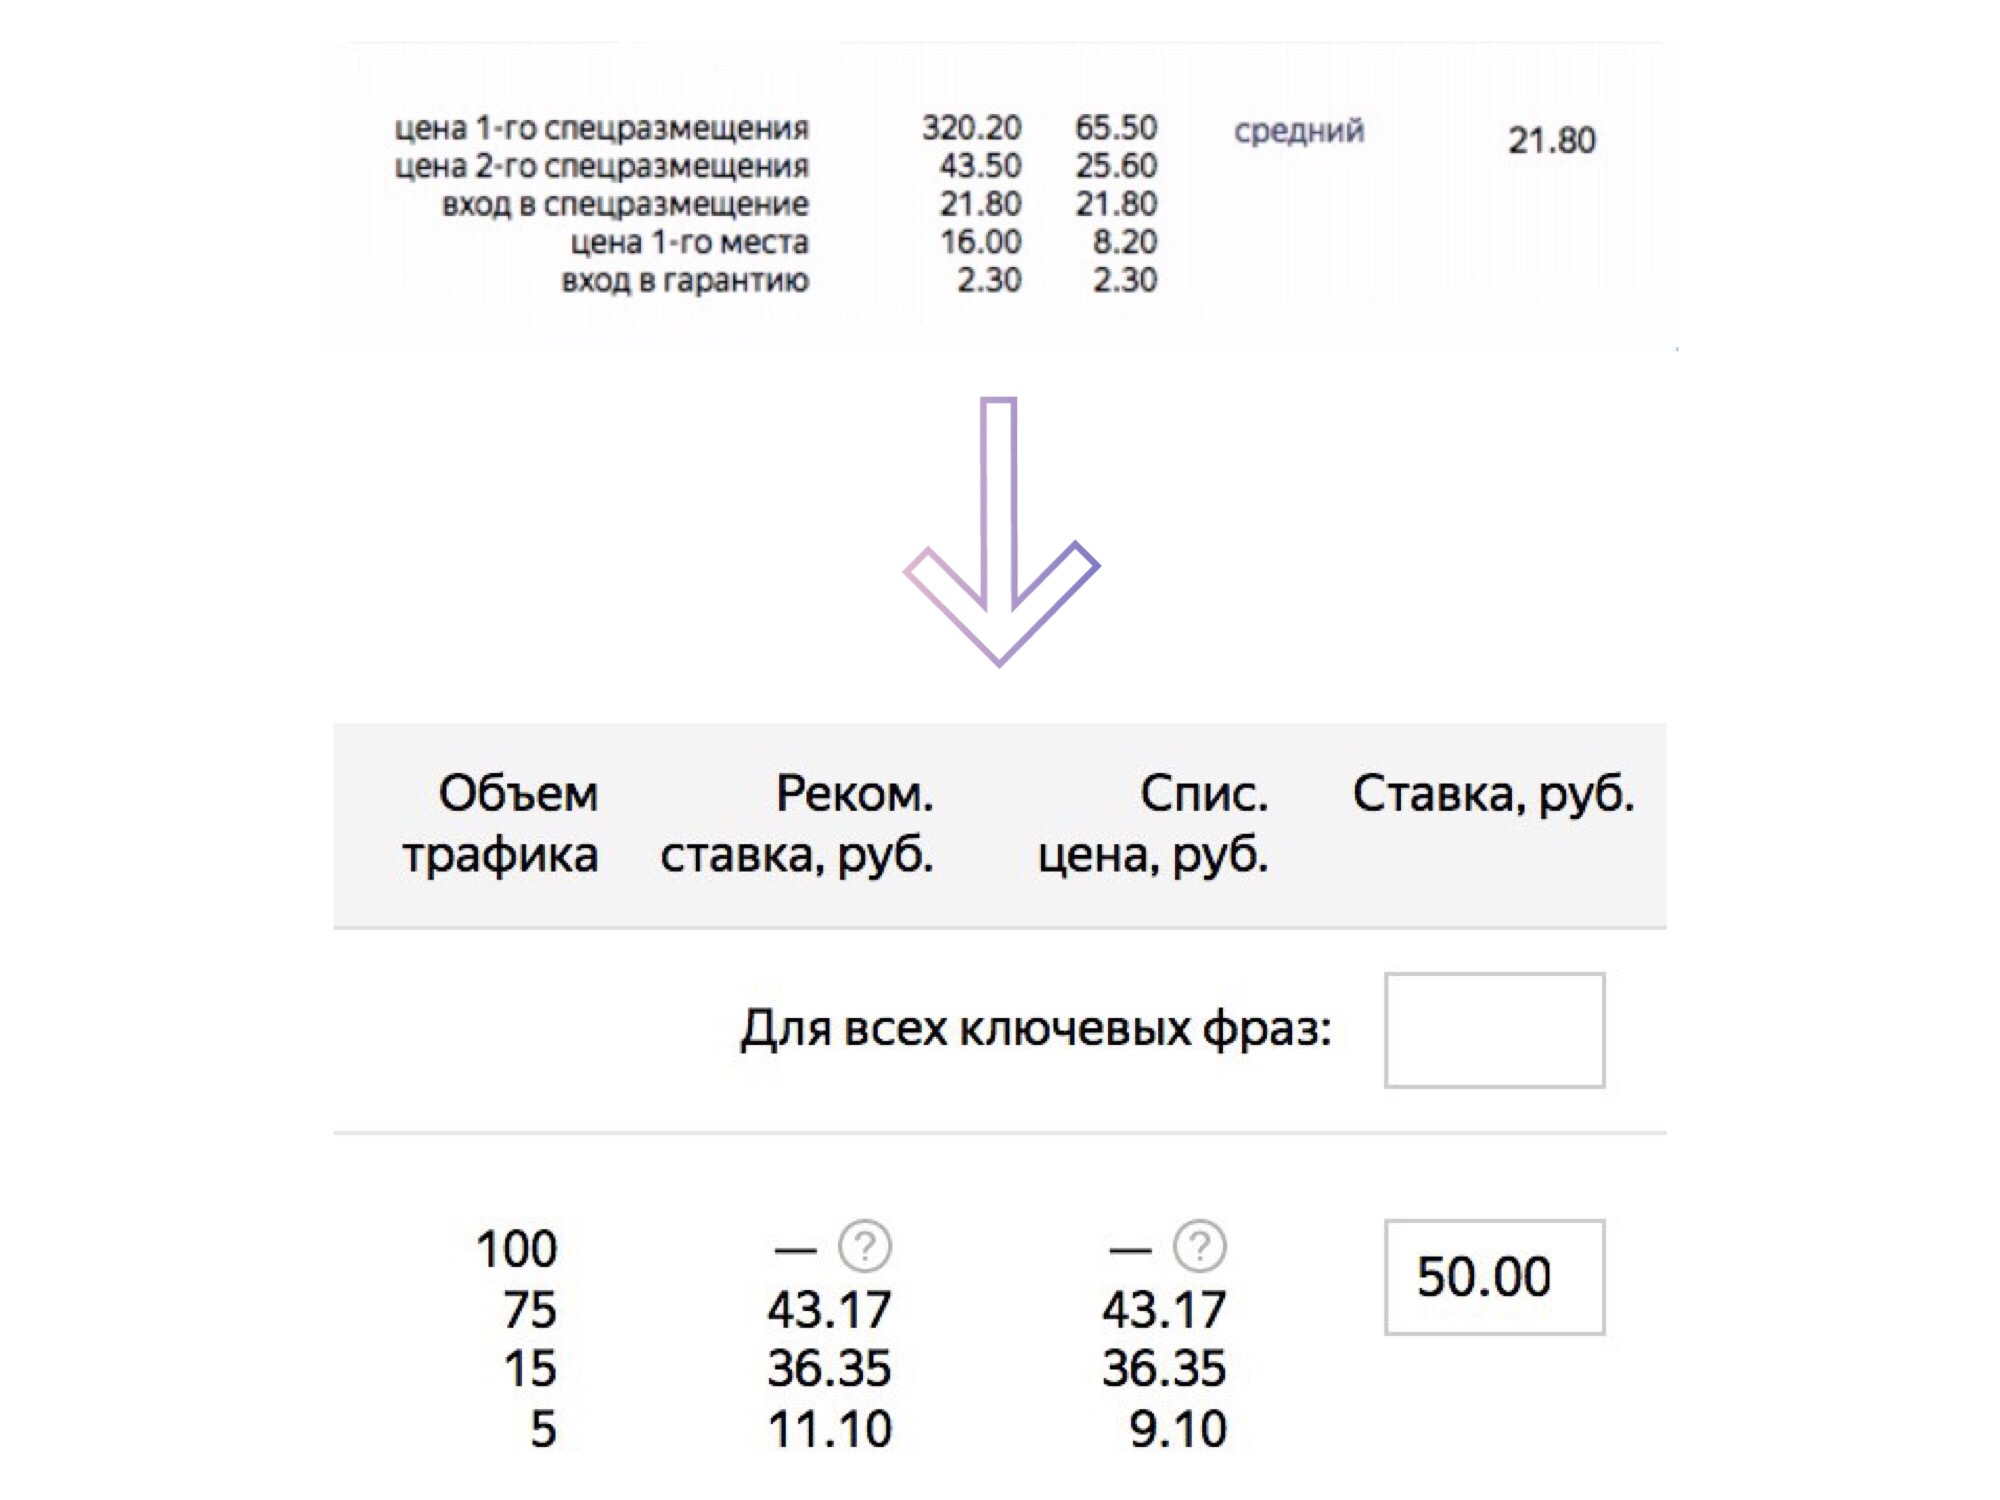 Объем трафика вместо позиций в интерфейсе торгов